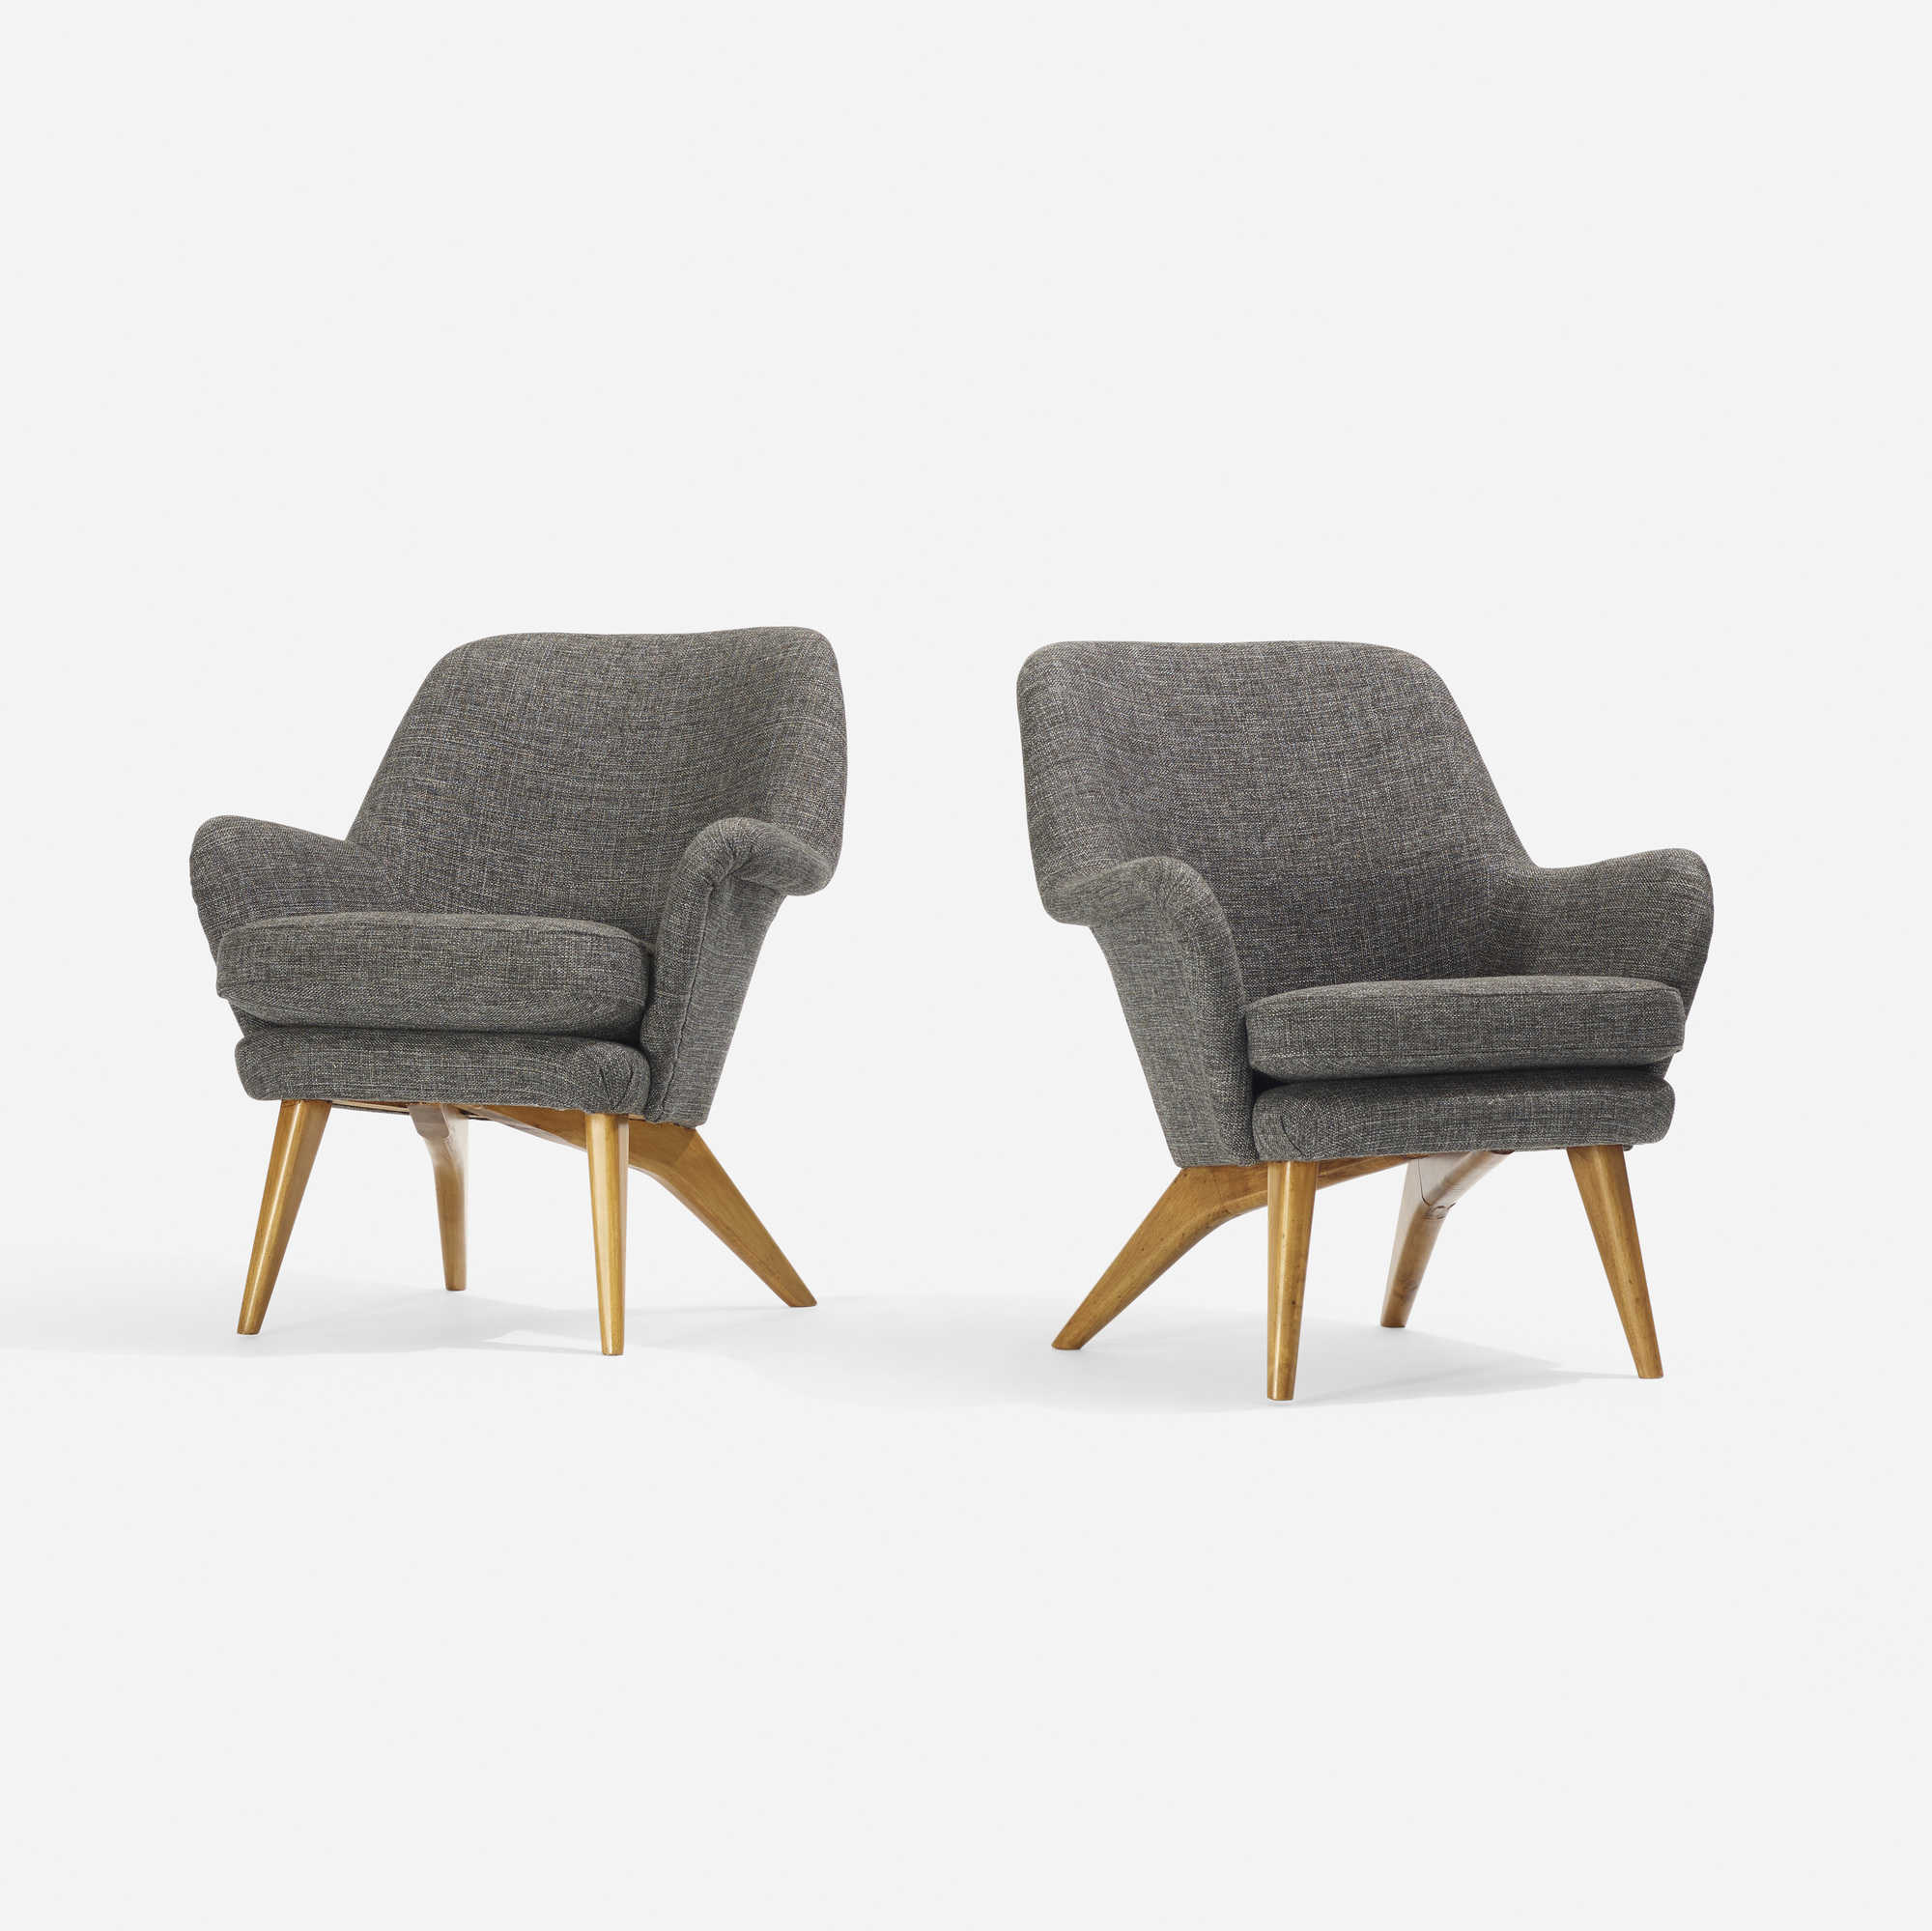 322: Carl-Gustav Hiort af Ornäs / armchairs, pair (2 of 2)